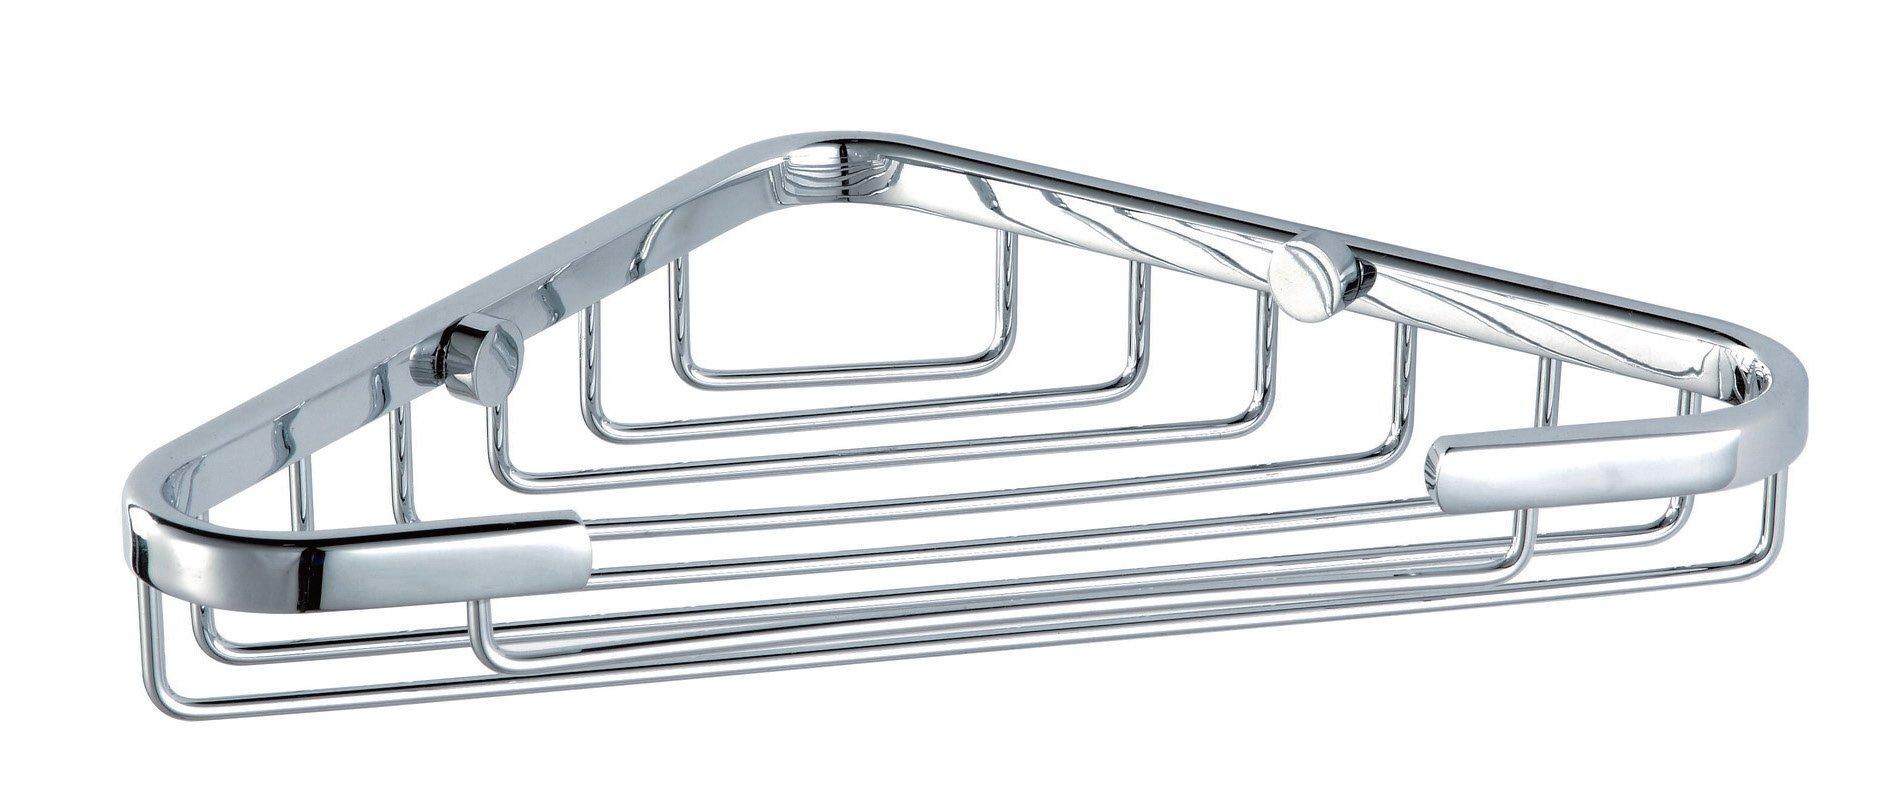 Corner Shower Caddy - Rustproof Stainless Steel Wall Mount Shower Basket for Bathroom , Polished Chrome